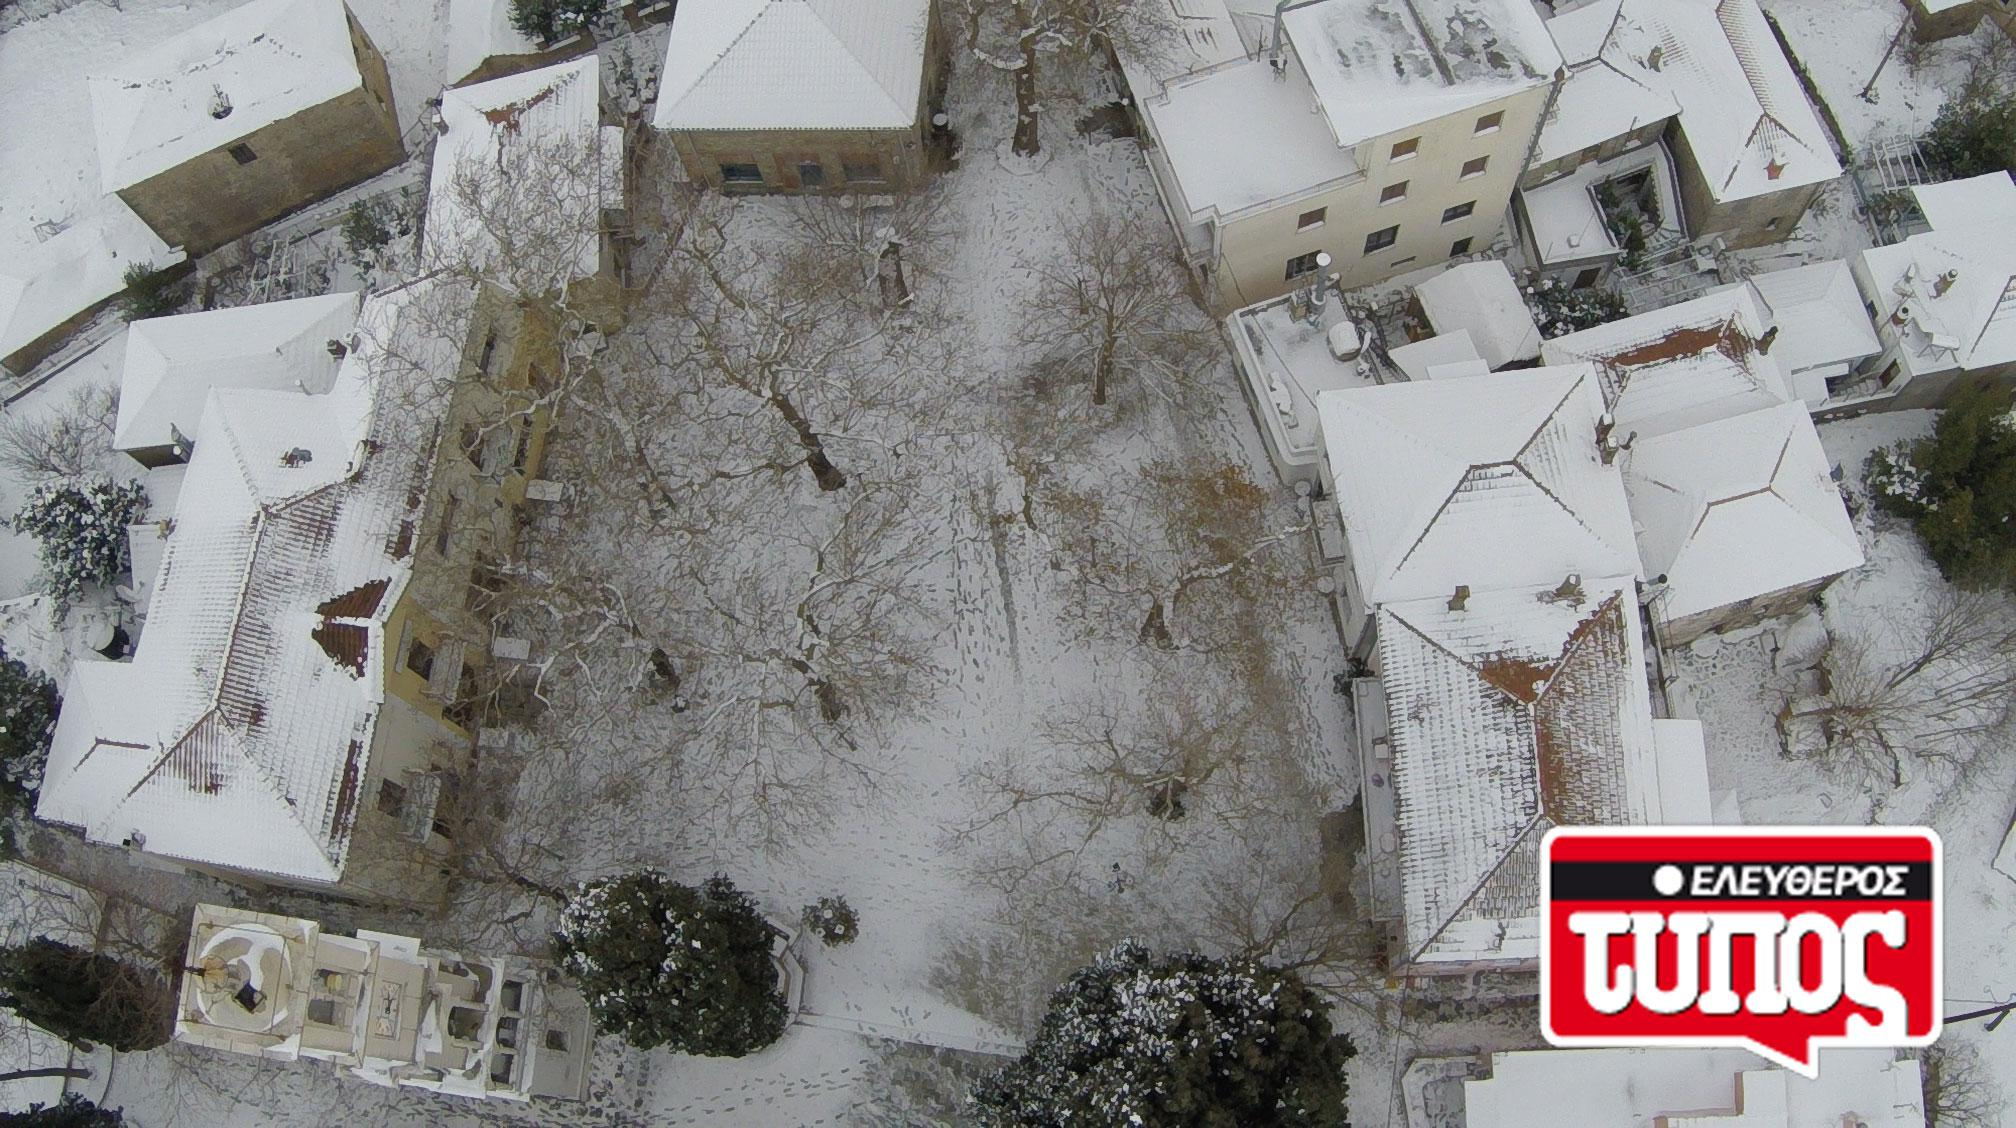 laukos-piliou-xionismenos-aerofotografies-1300-12 Εντυπωσιακές αεροφωτογραφίες από το χιονισμένο Λαύκο Πηλίου [εικόνες]